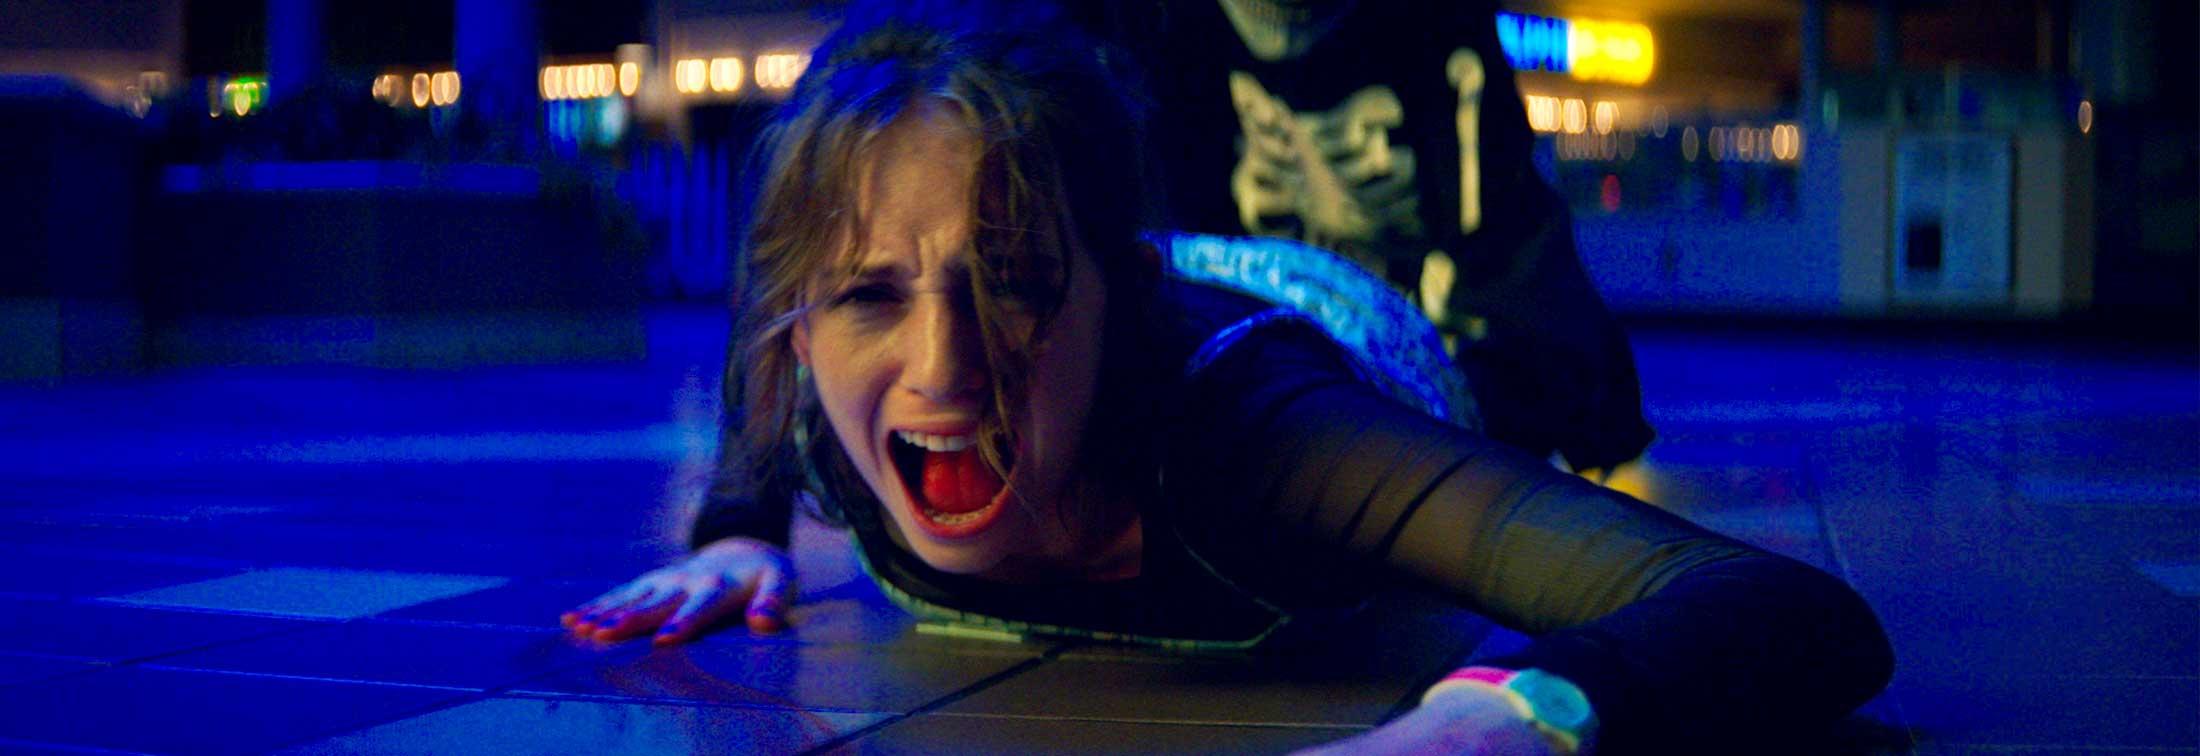 Fear Street Part One: 1994 - Noisily nostalgic teen schlock horror